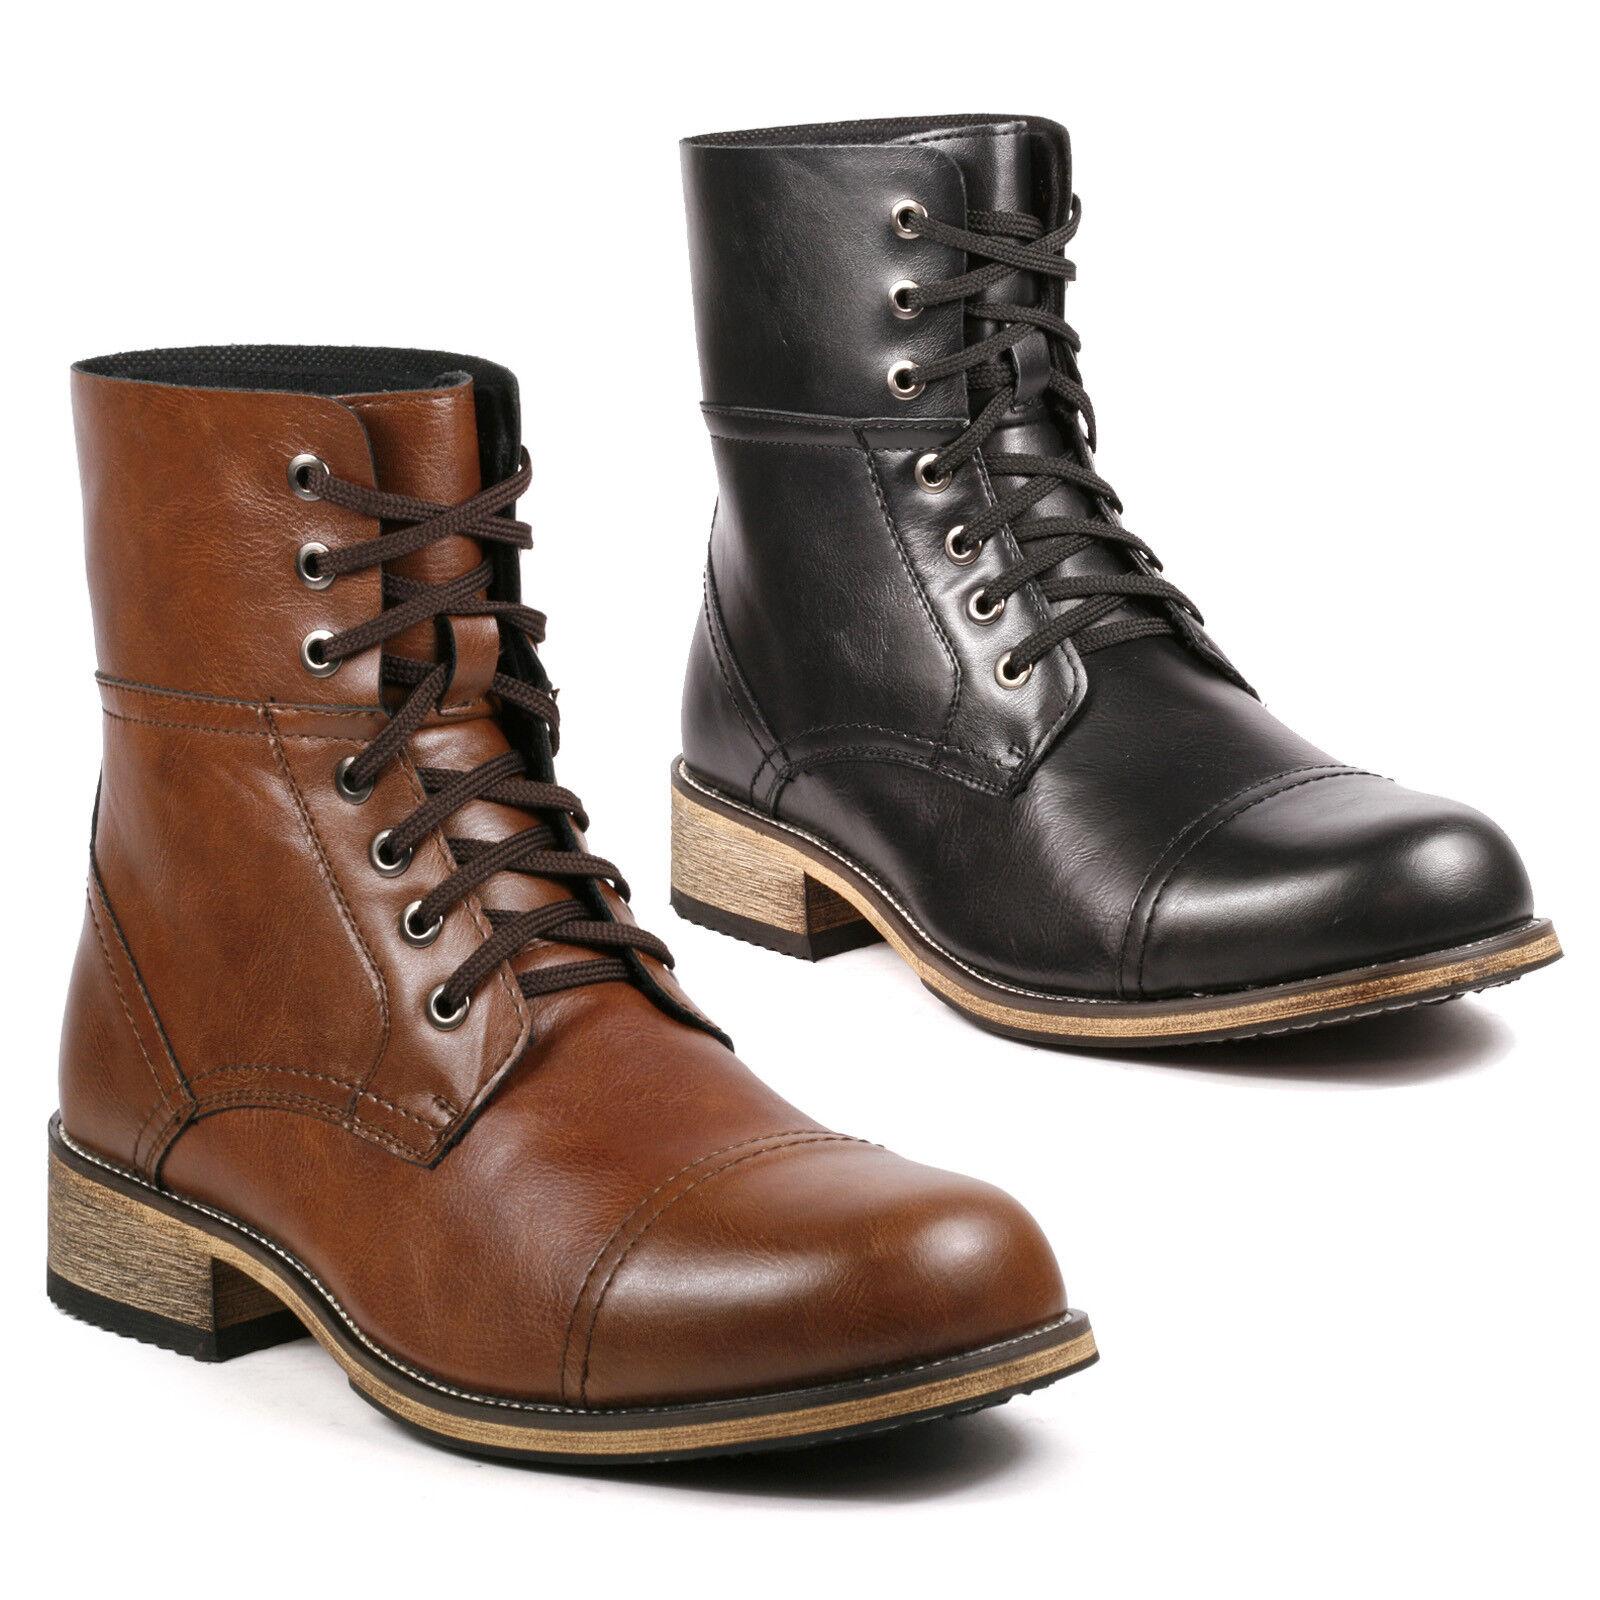 Metrocharm MC001 Men's Lace Up Cap Toe Work Desert Fashion Ankle Boots